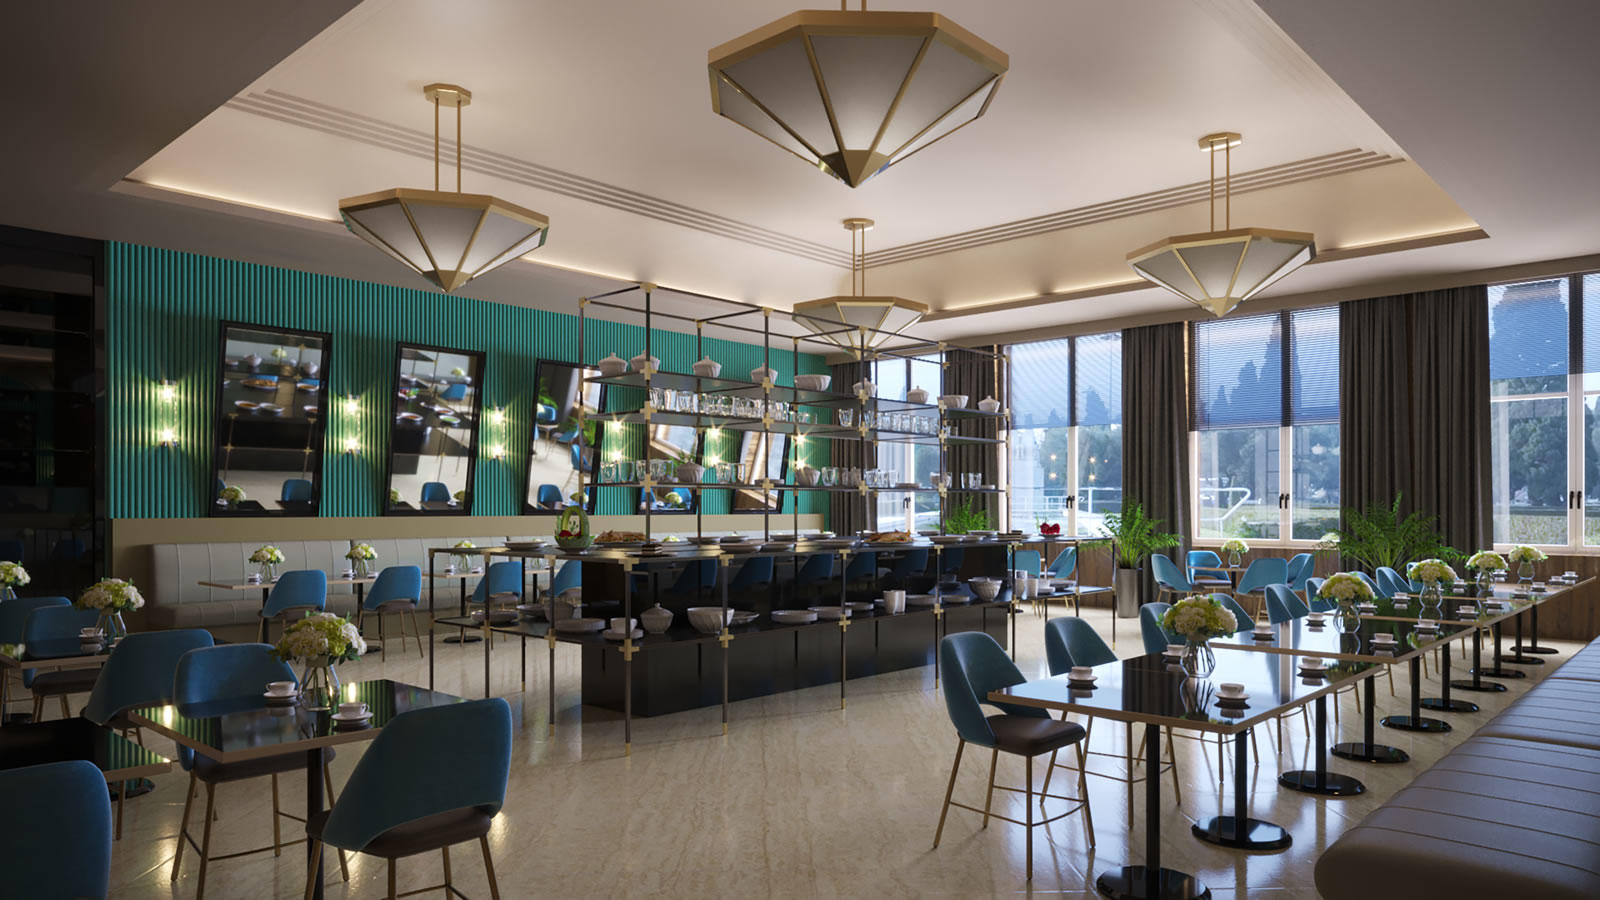 Breakfast room | Principi di Piemonte